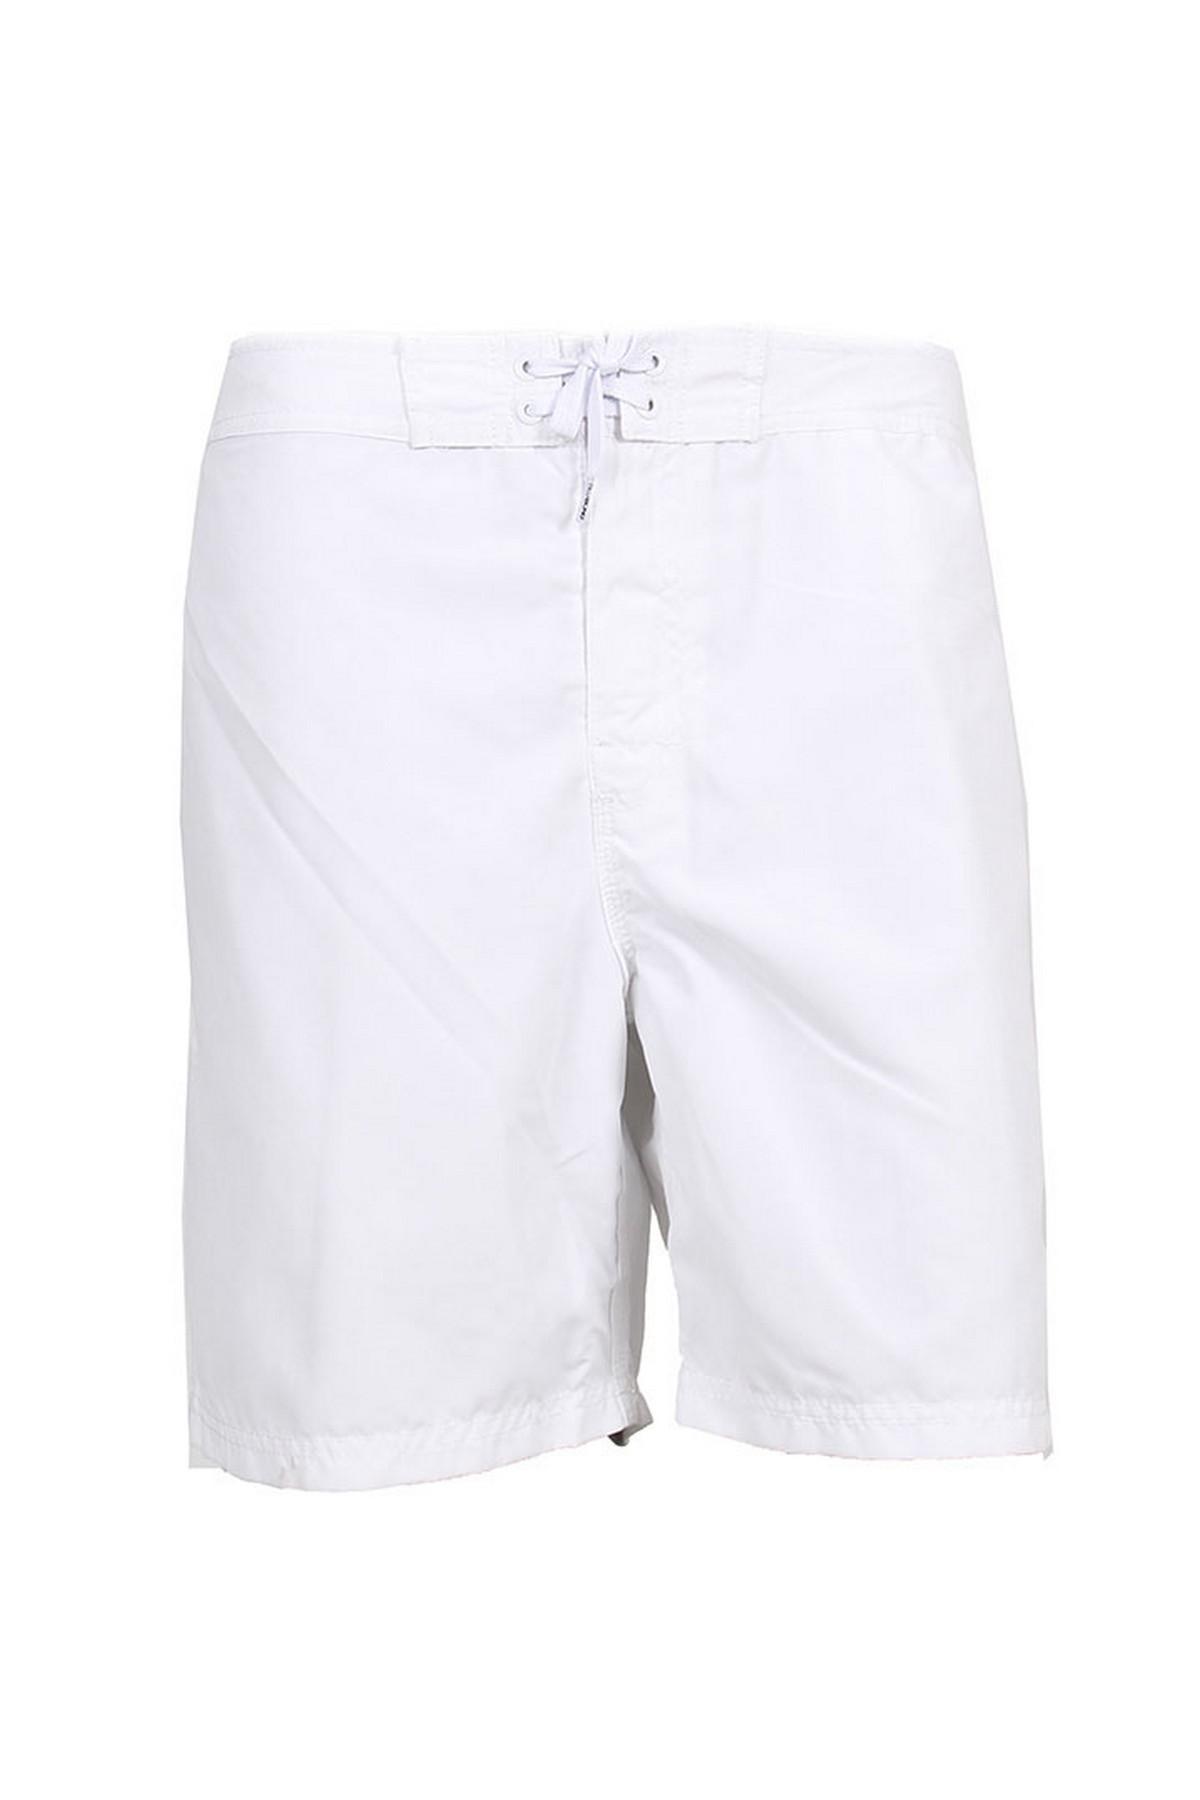 Billabong Space Palms Shorts Beyaz Erkek Şort (M1RT01-0010)